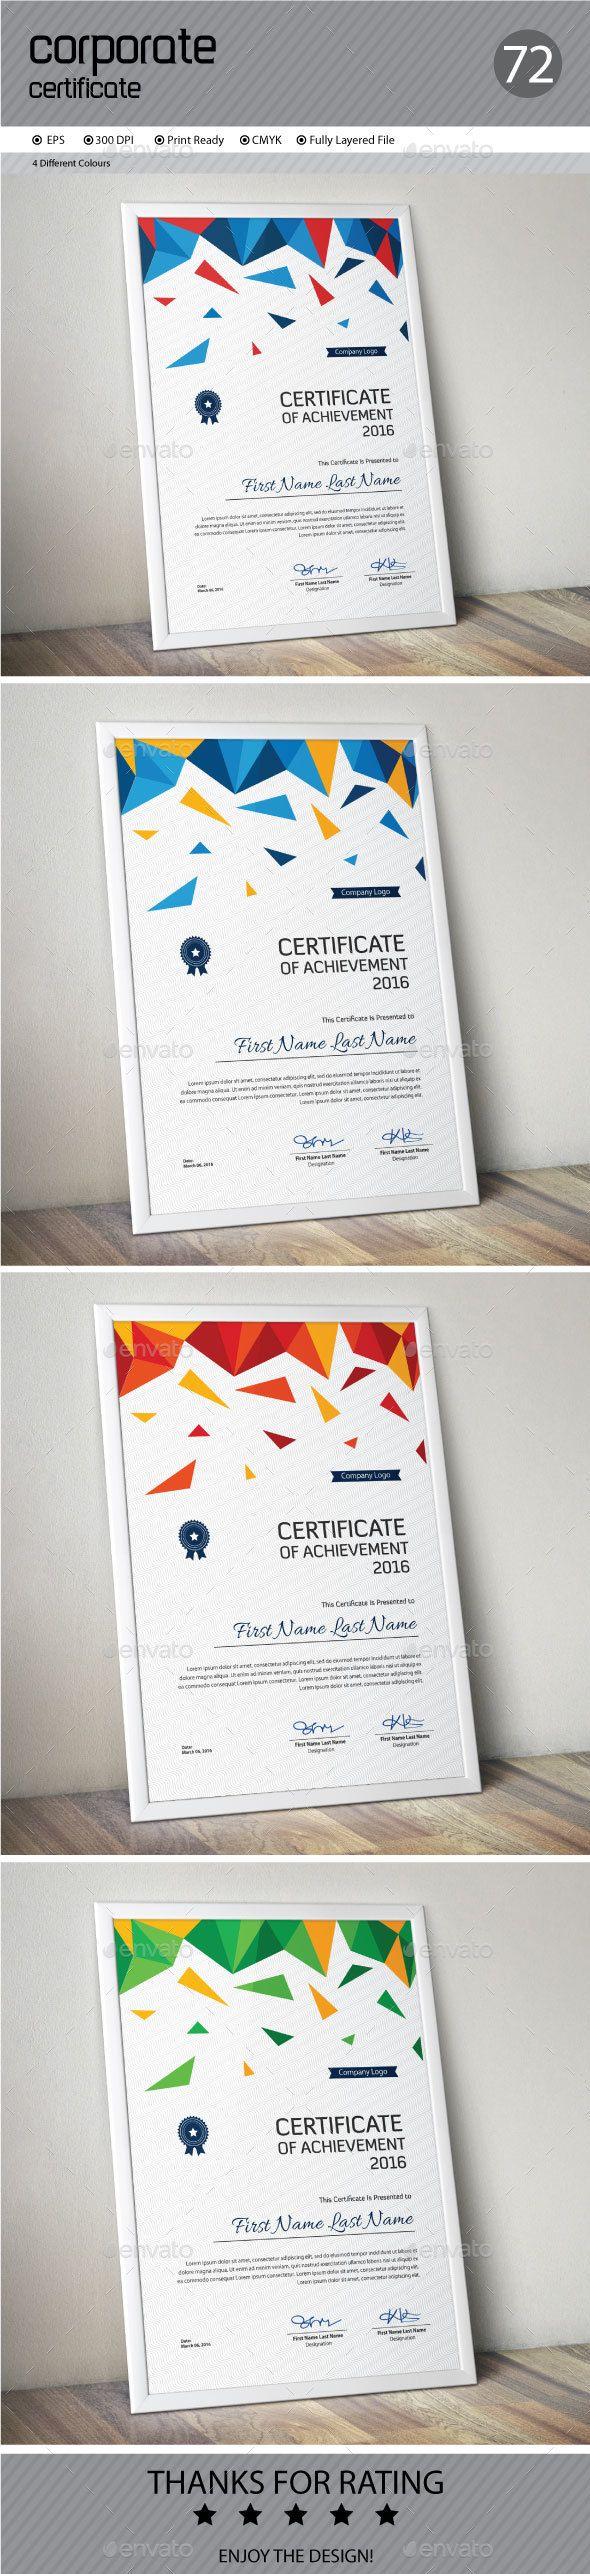 illustrator certificate template - 25 best ideas about certificate design on pinterest